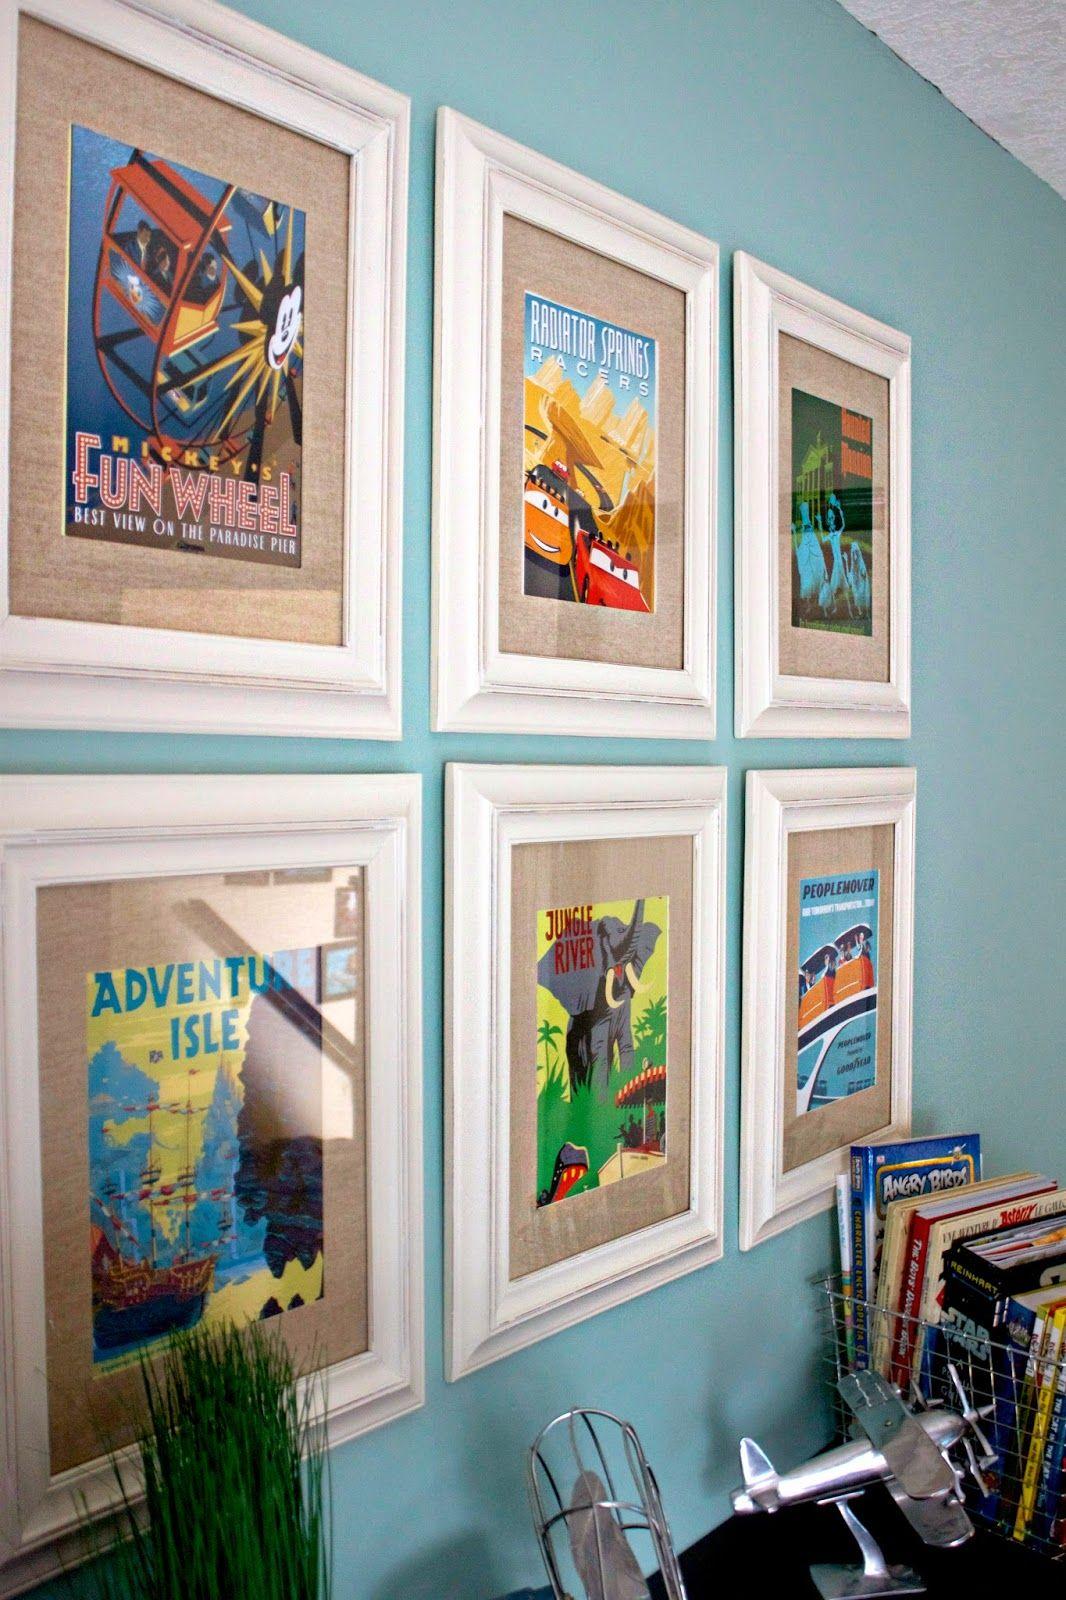 51 Ways To Diy The Bedroom Of Your Kids Dreams: Disney California Adventure Themed Room